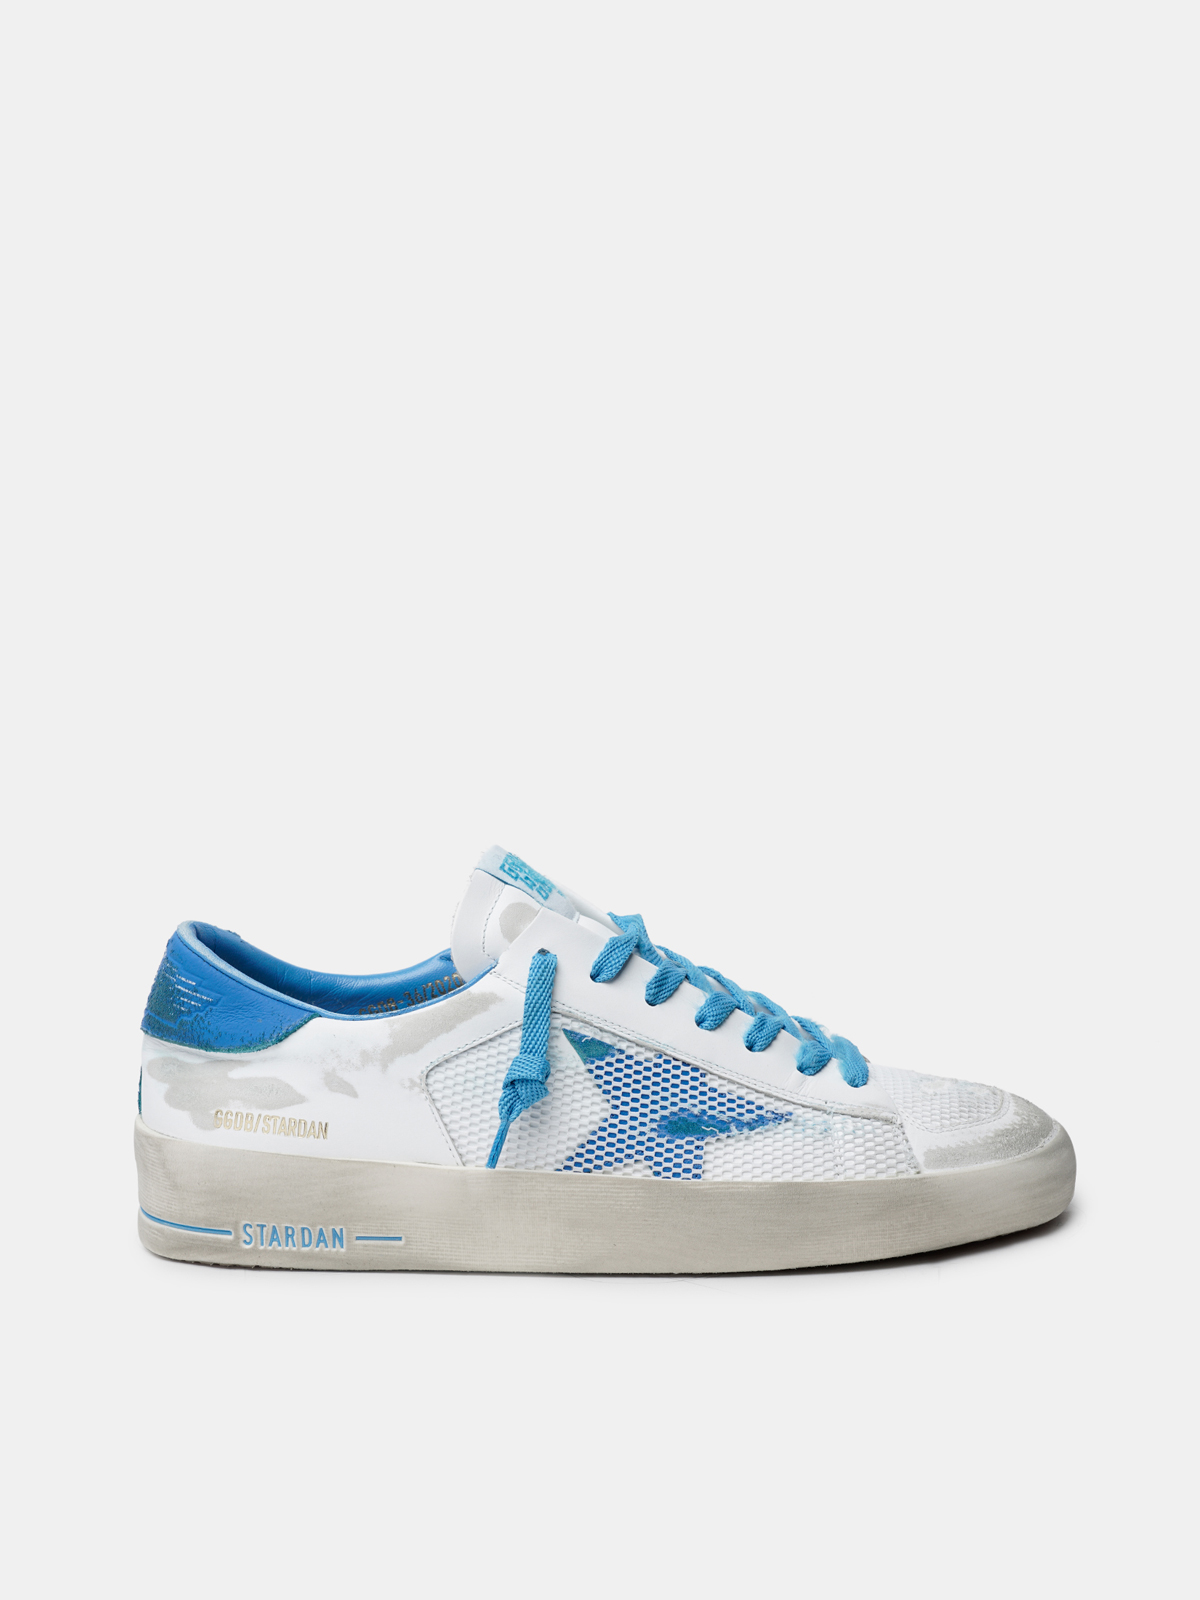 Golden Goose - White and light blue Stardan sneakers in